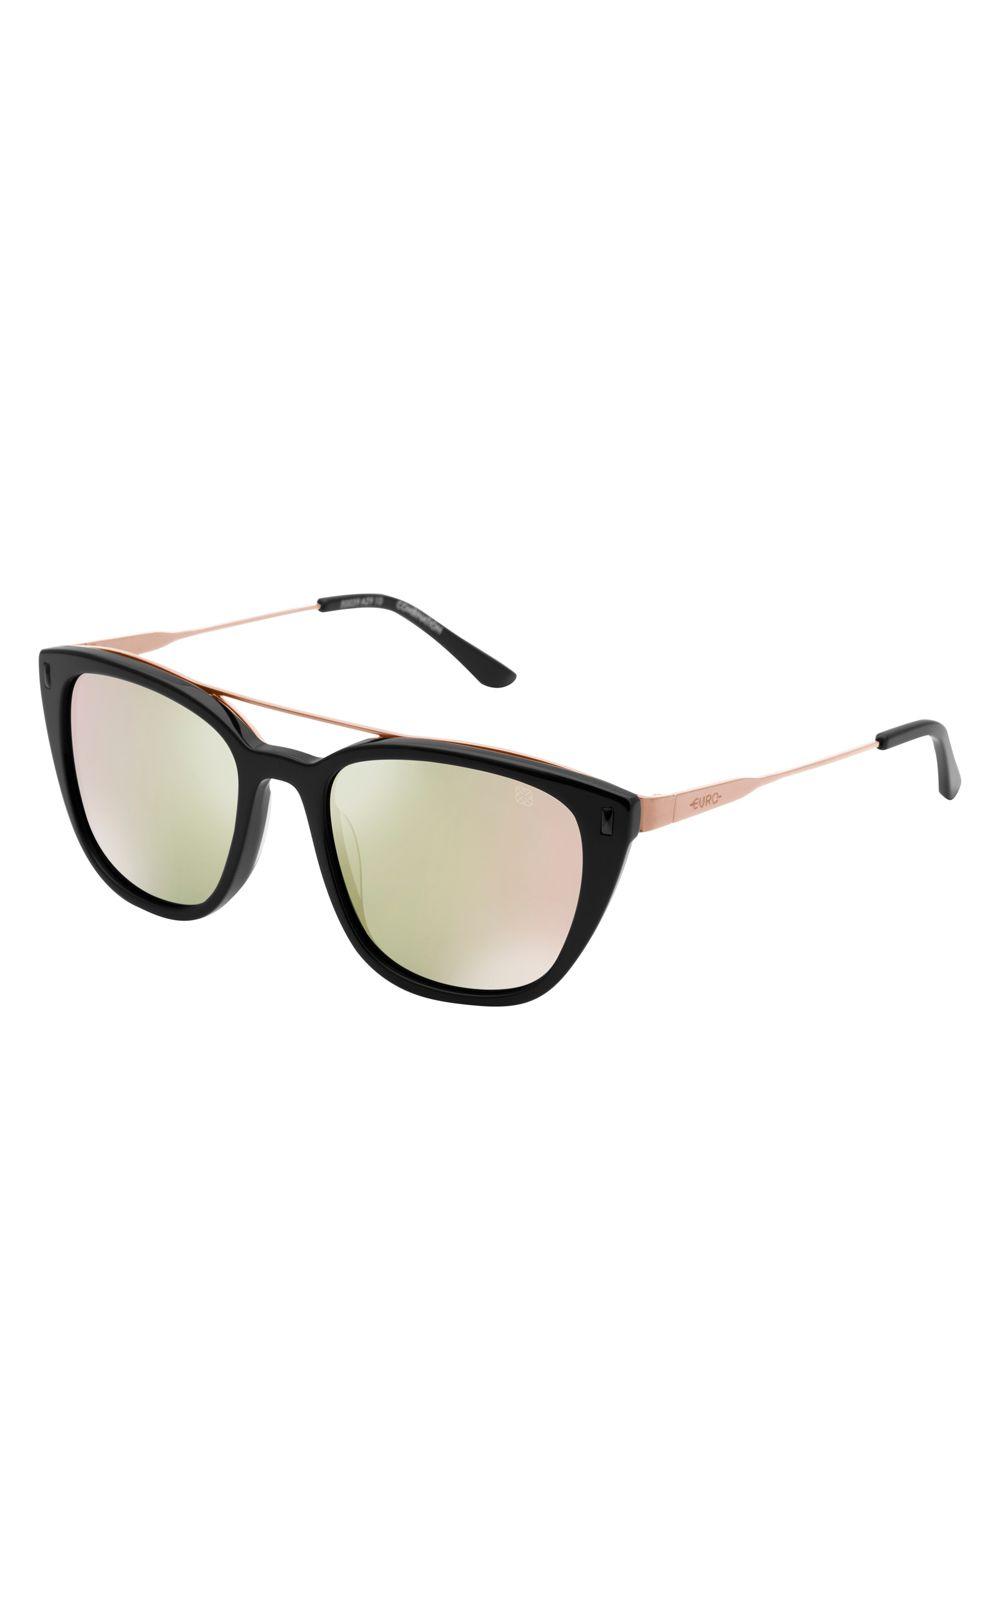 Foto 2 - Óculos Euro Fashion Basics Preto E0039A2910/4J